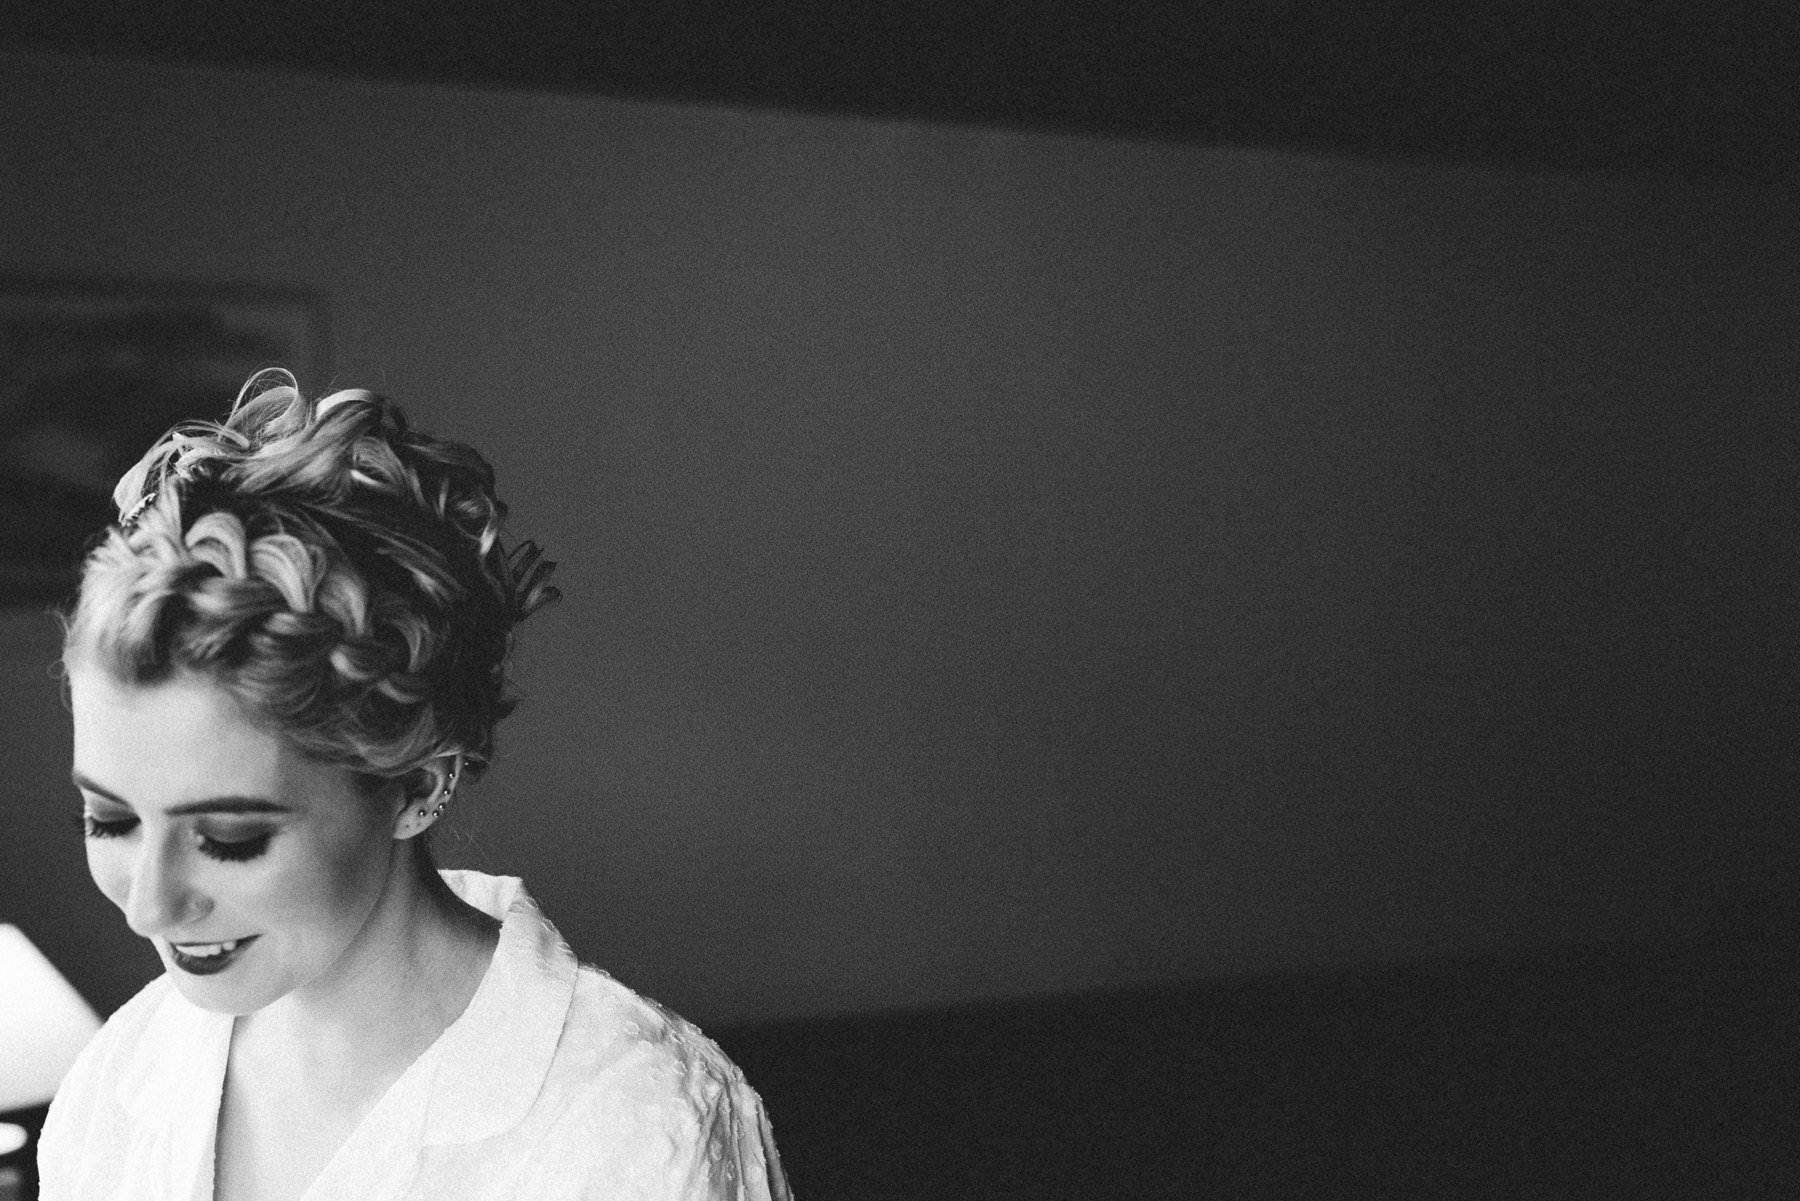 bridal portrait lgbt wedding photographer northern ireland